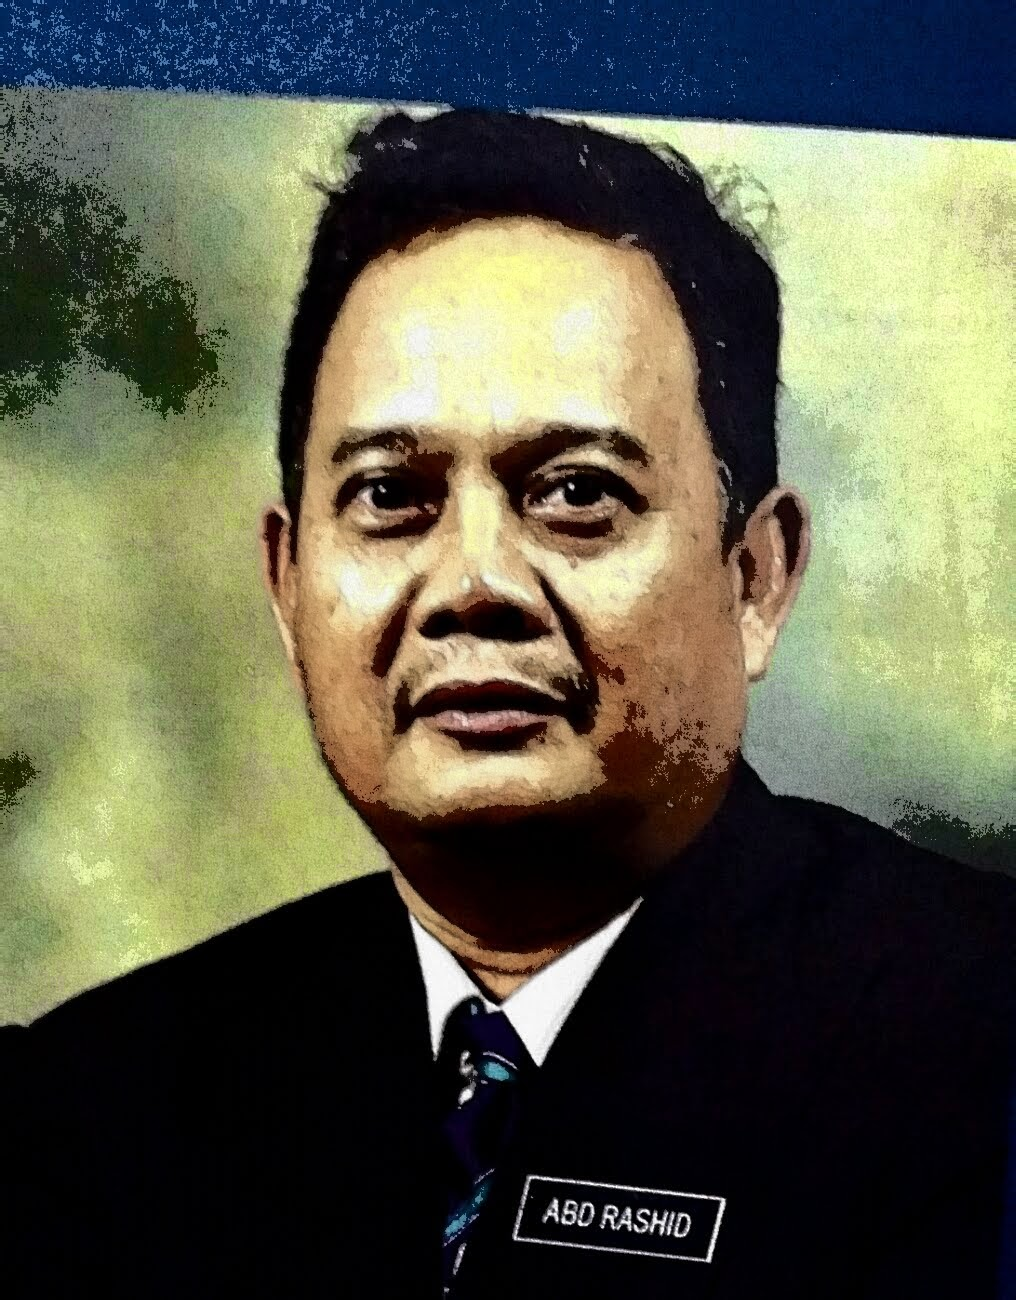 Hj. Abdul Rashid b. Hj Othman : Selamat Bersara mulai 14.02.17